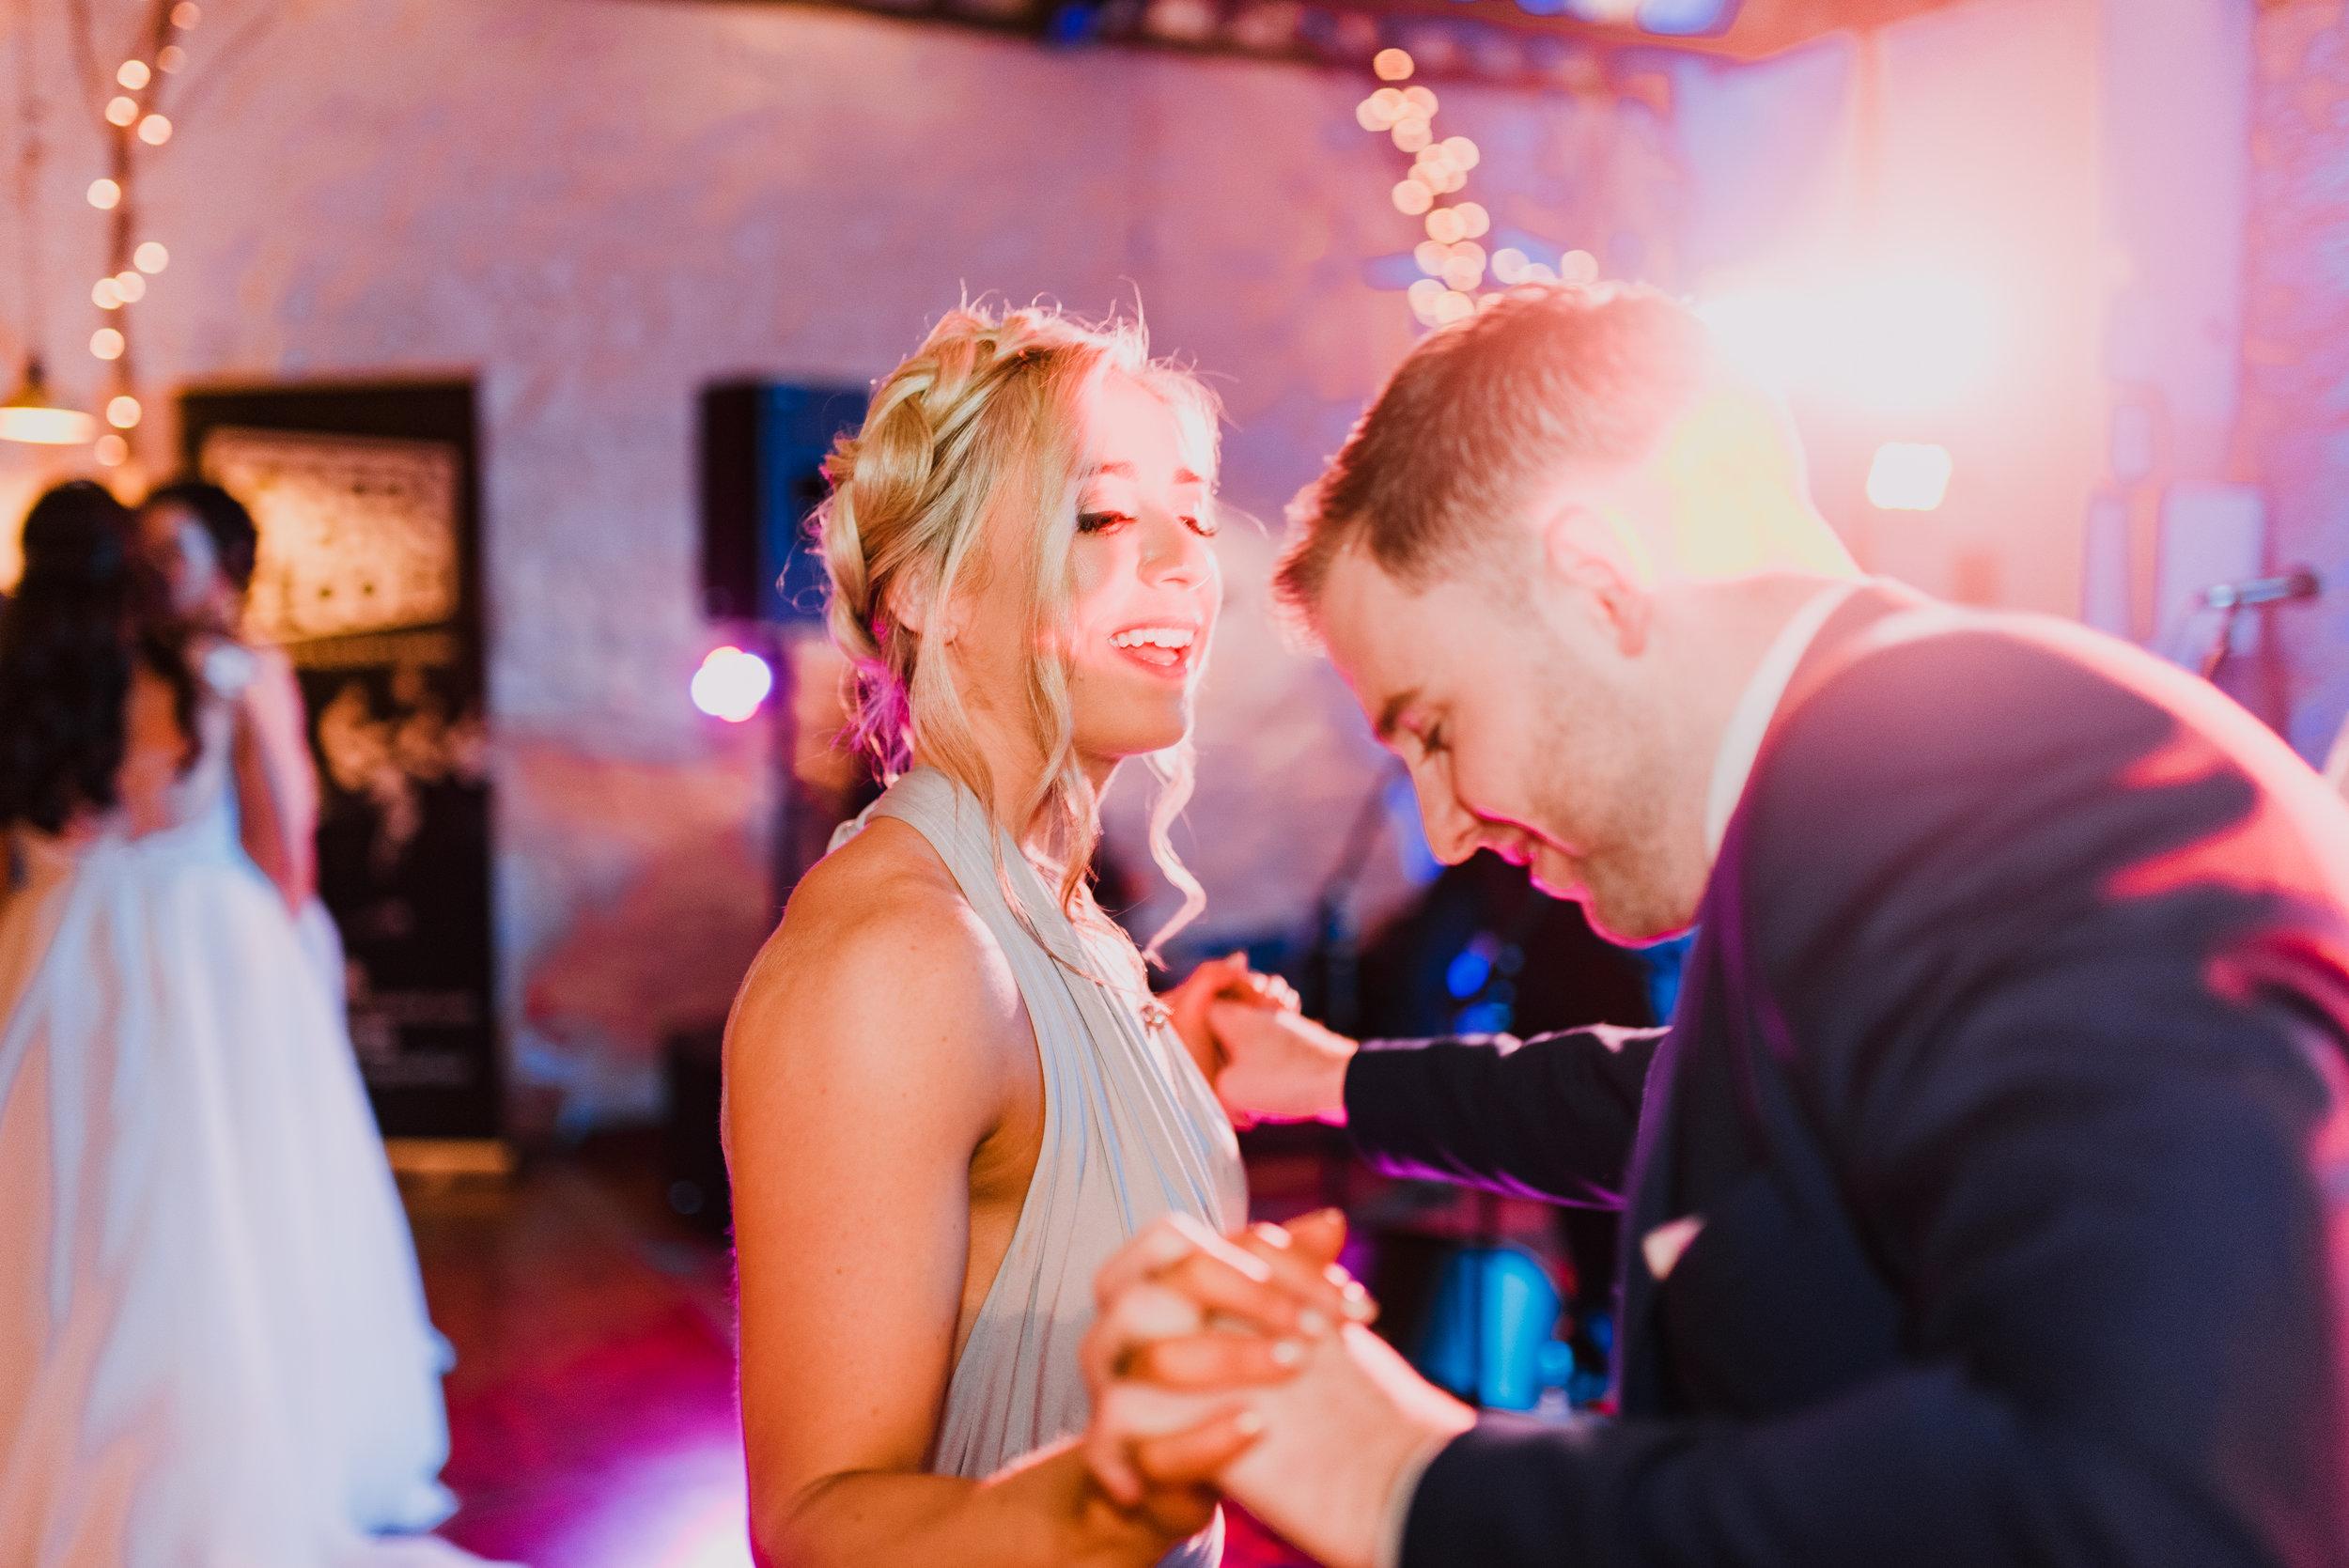 larchfield estate wedding, wedding venues northern ireland, barn wedding venues northern ireland, wedding photos larchfield estate, shane todd wedding, irish wedding, first dance (7).jpg